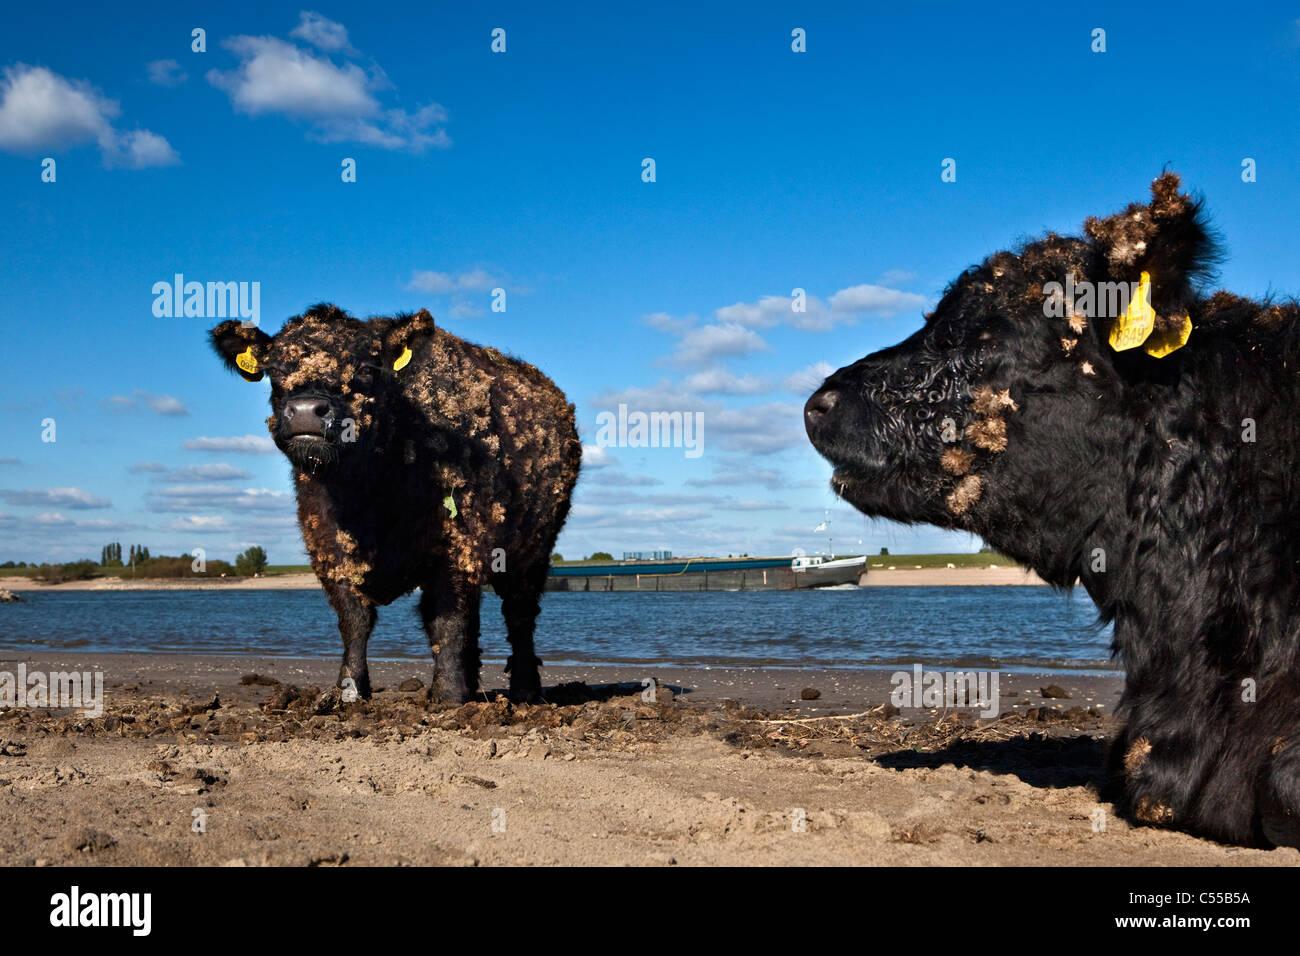 Die Niederlande, Ooij, Ooij-Polder. Galloway-Kuh. Hintergrund: Frachtboot am Fluss Waal. Stockbild